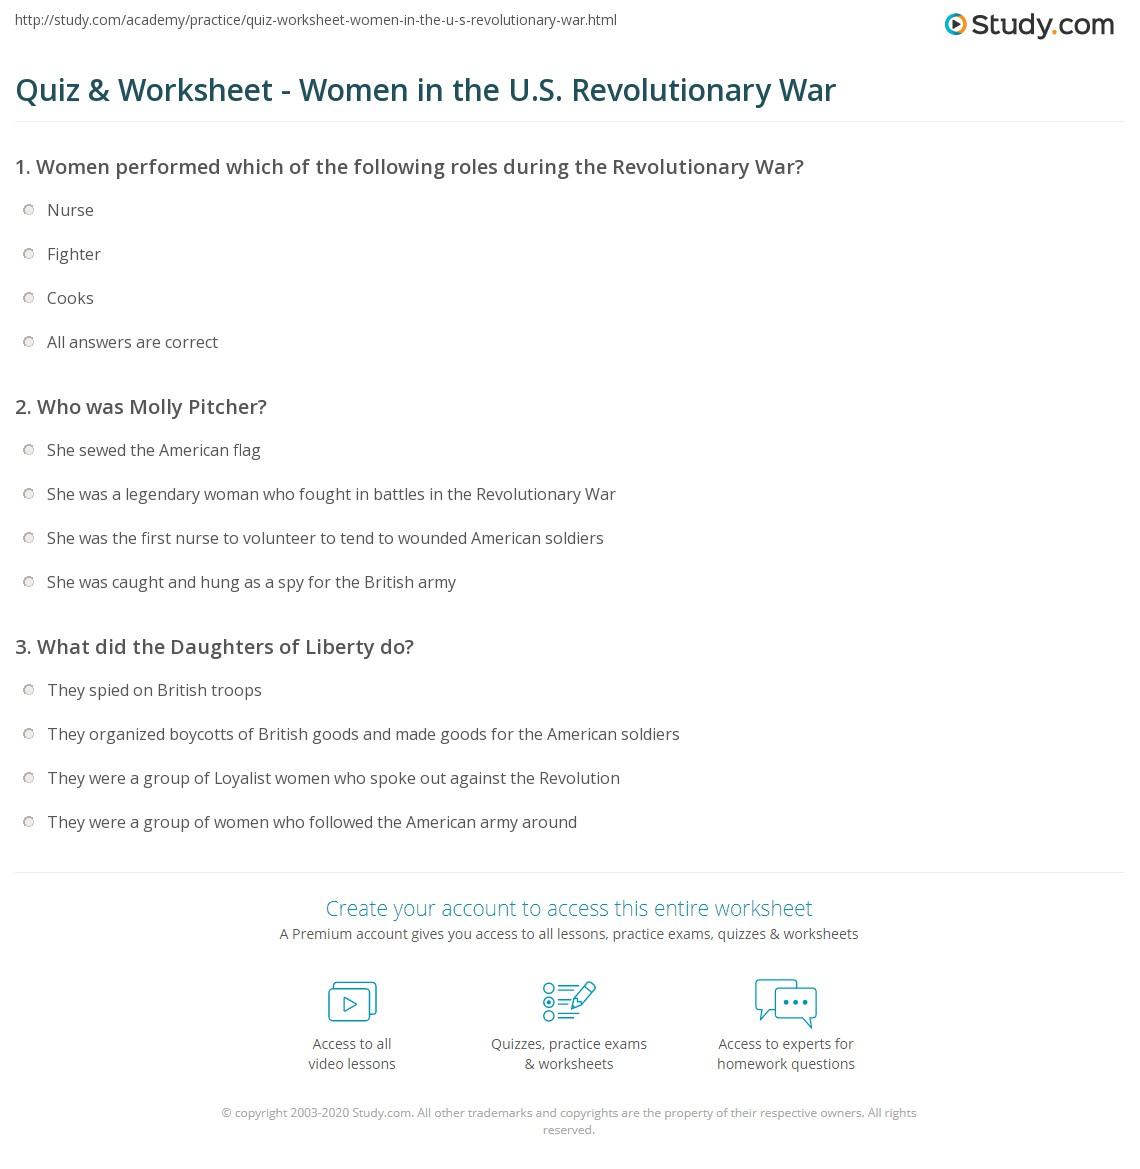 Worksheets American Revolutionary War Worksheets quiz worksheet women in the u s revolutionary war study com print roles of worksheet